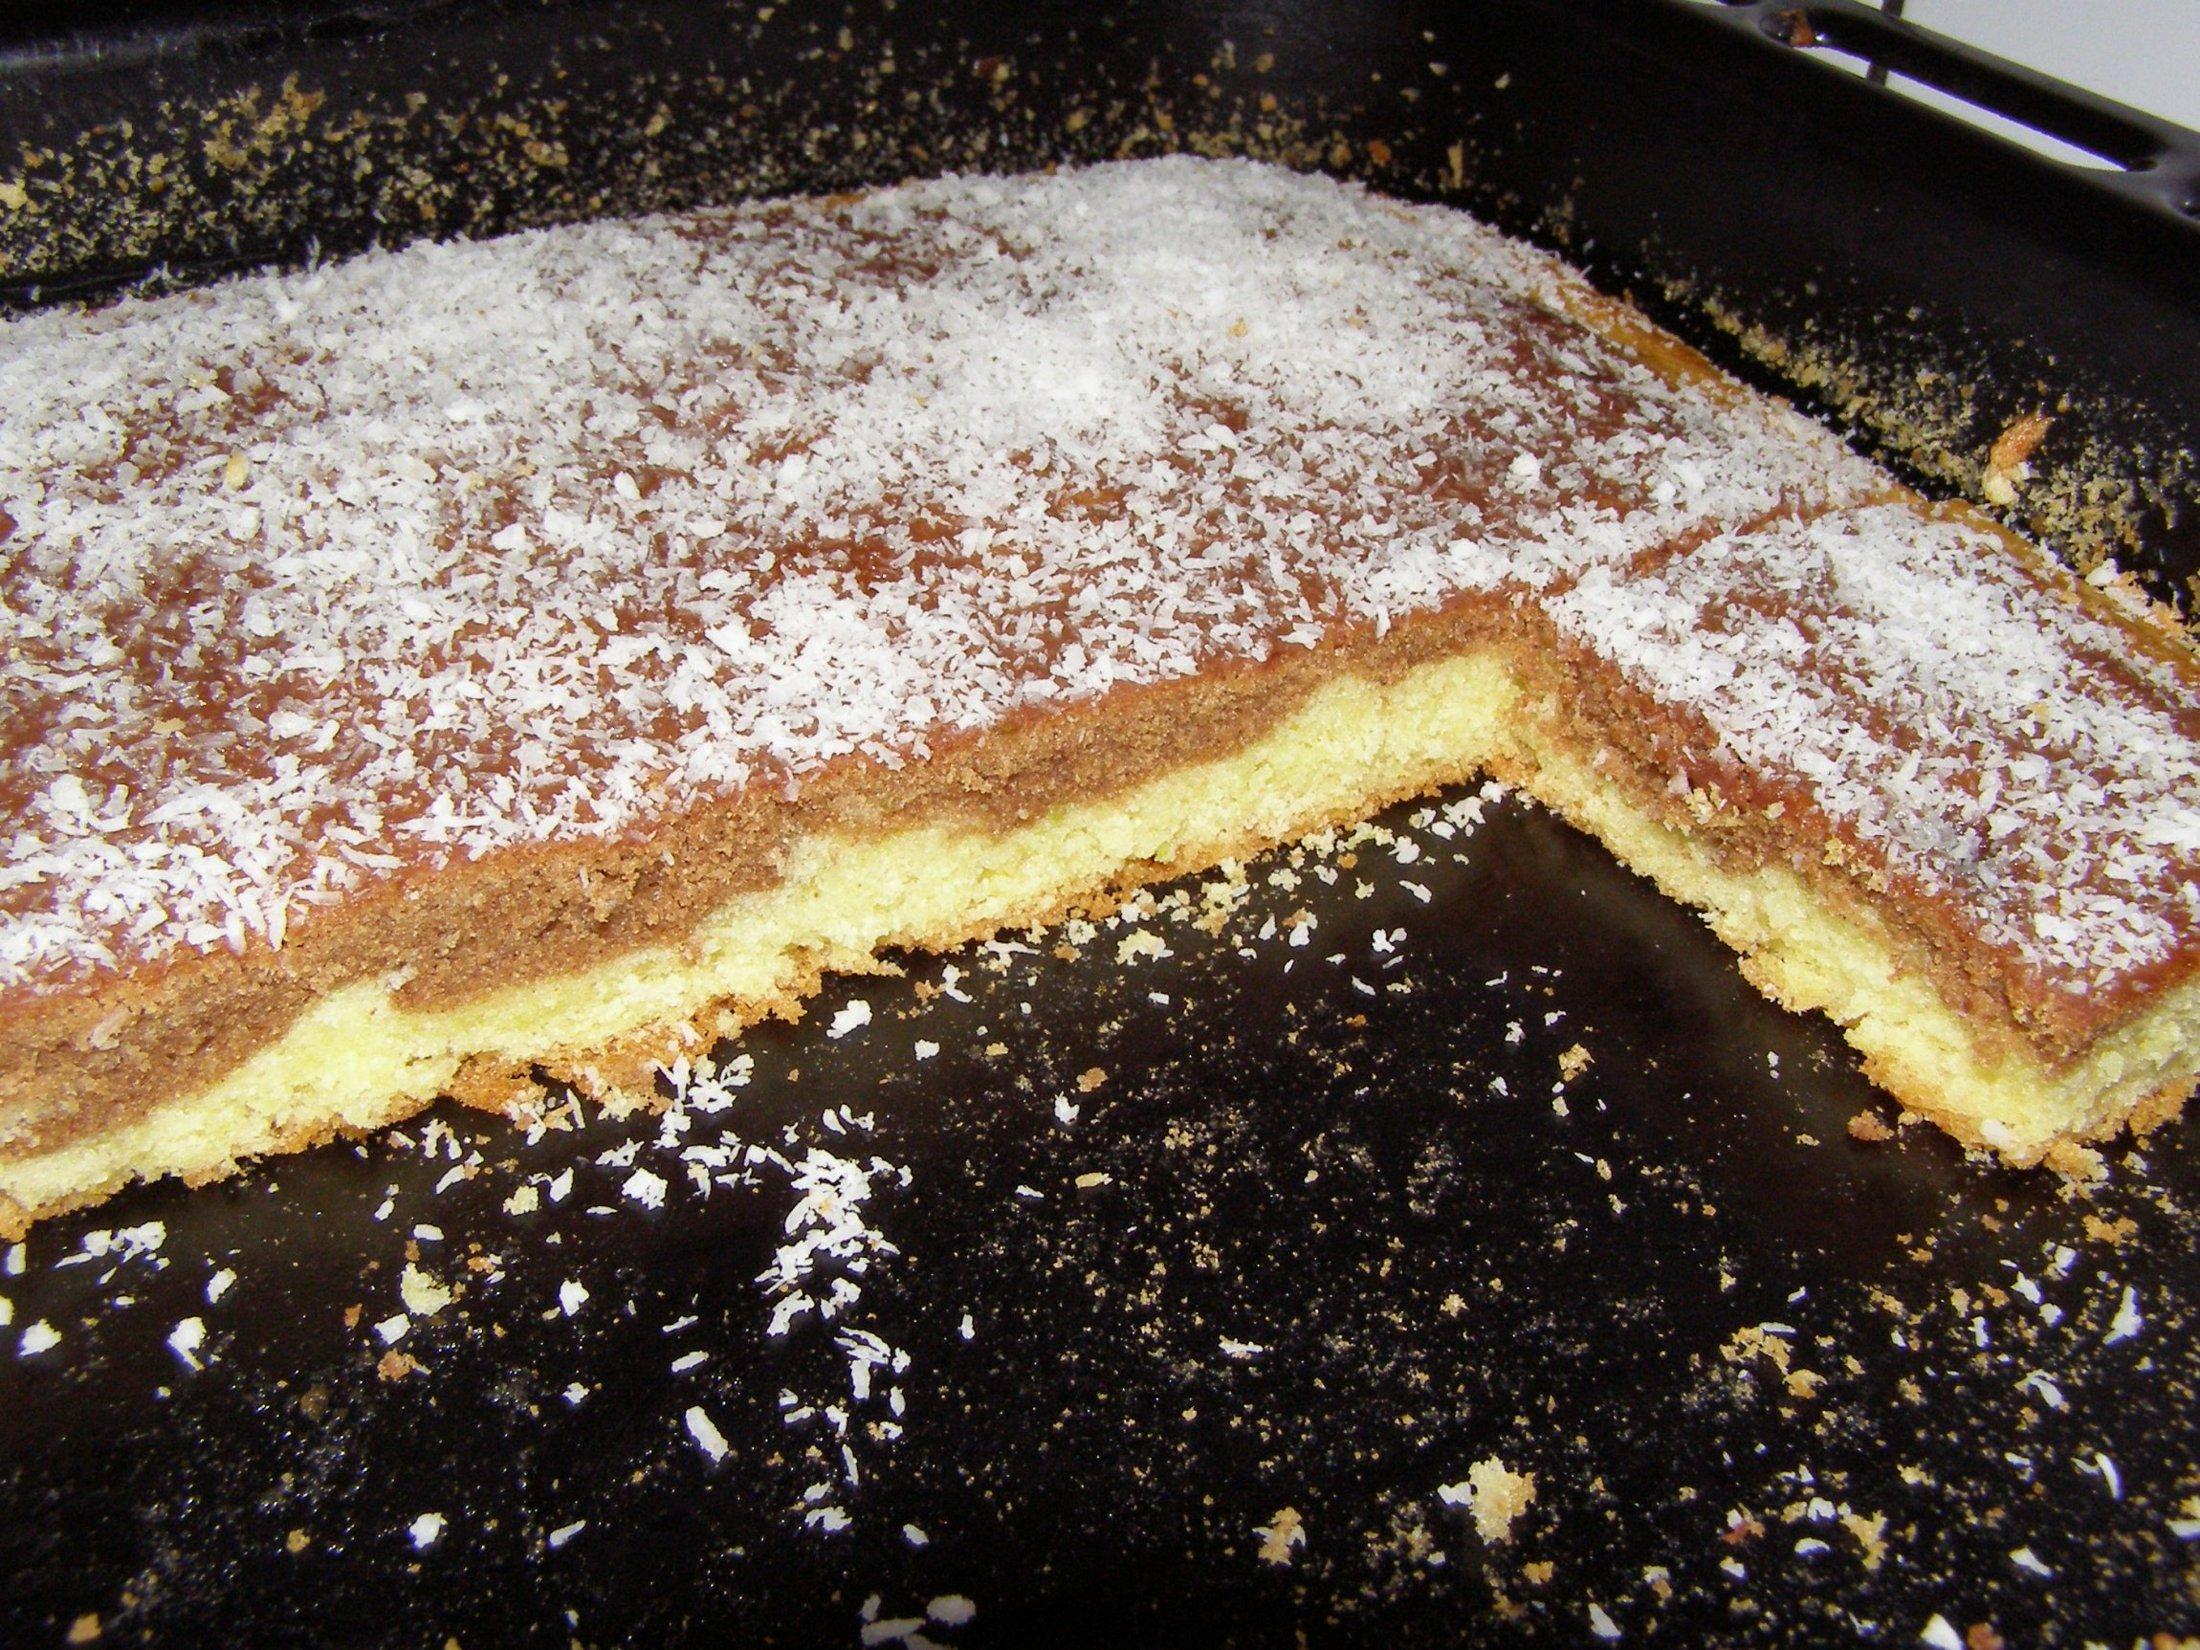 Recept Cuketová buchta - Trochu sem tu placku vylepšila navrch sem dala čokoládu a kokos.